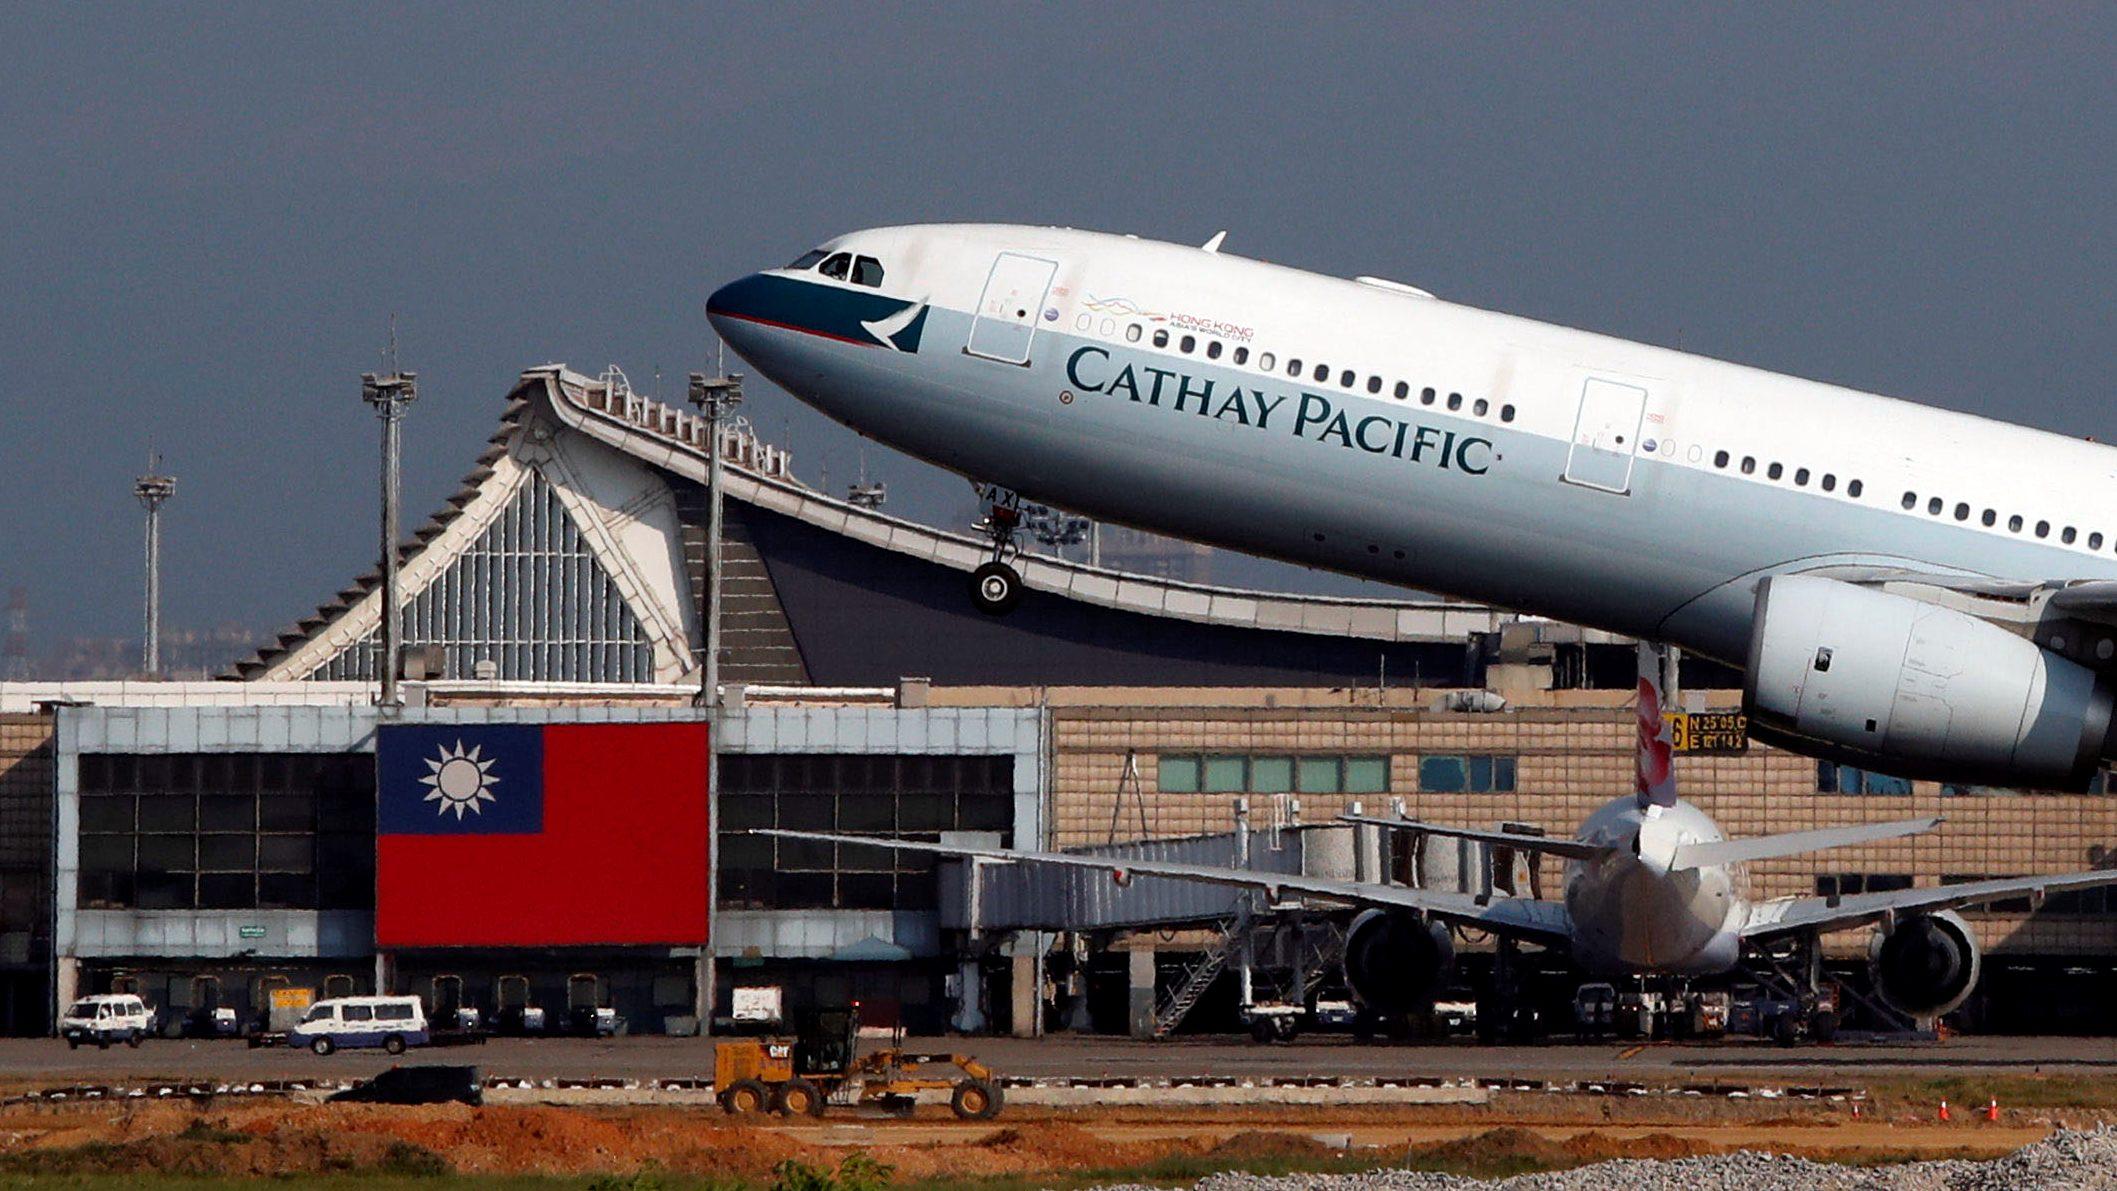 Hong Kong's Cathay Pacific Airways Airbus A330 passenger plane takes off near a Taiwanese national flag at Taoyuan International Airport